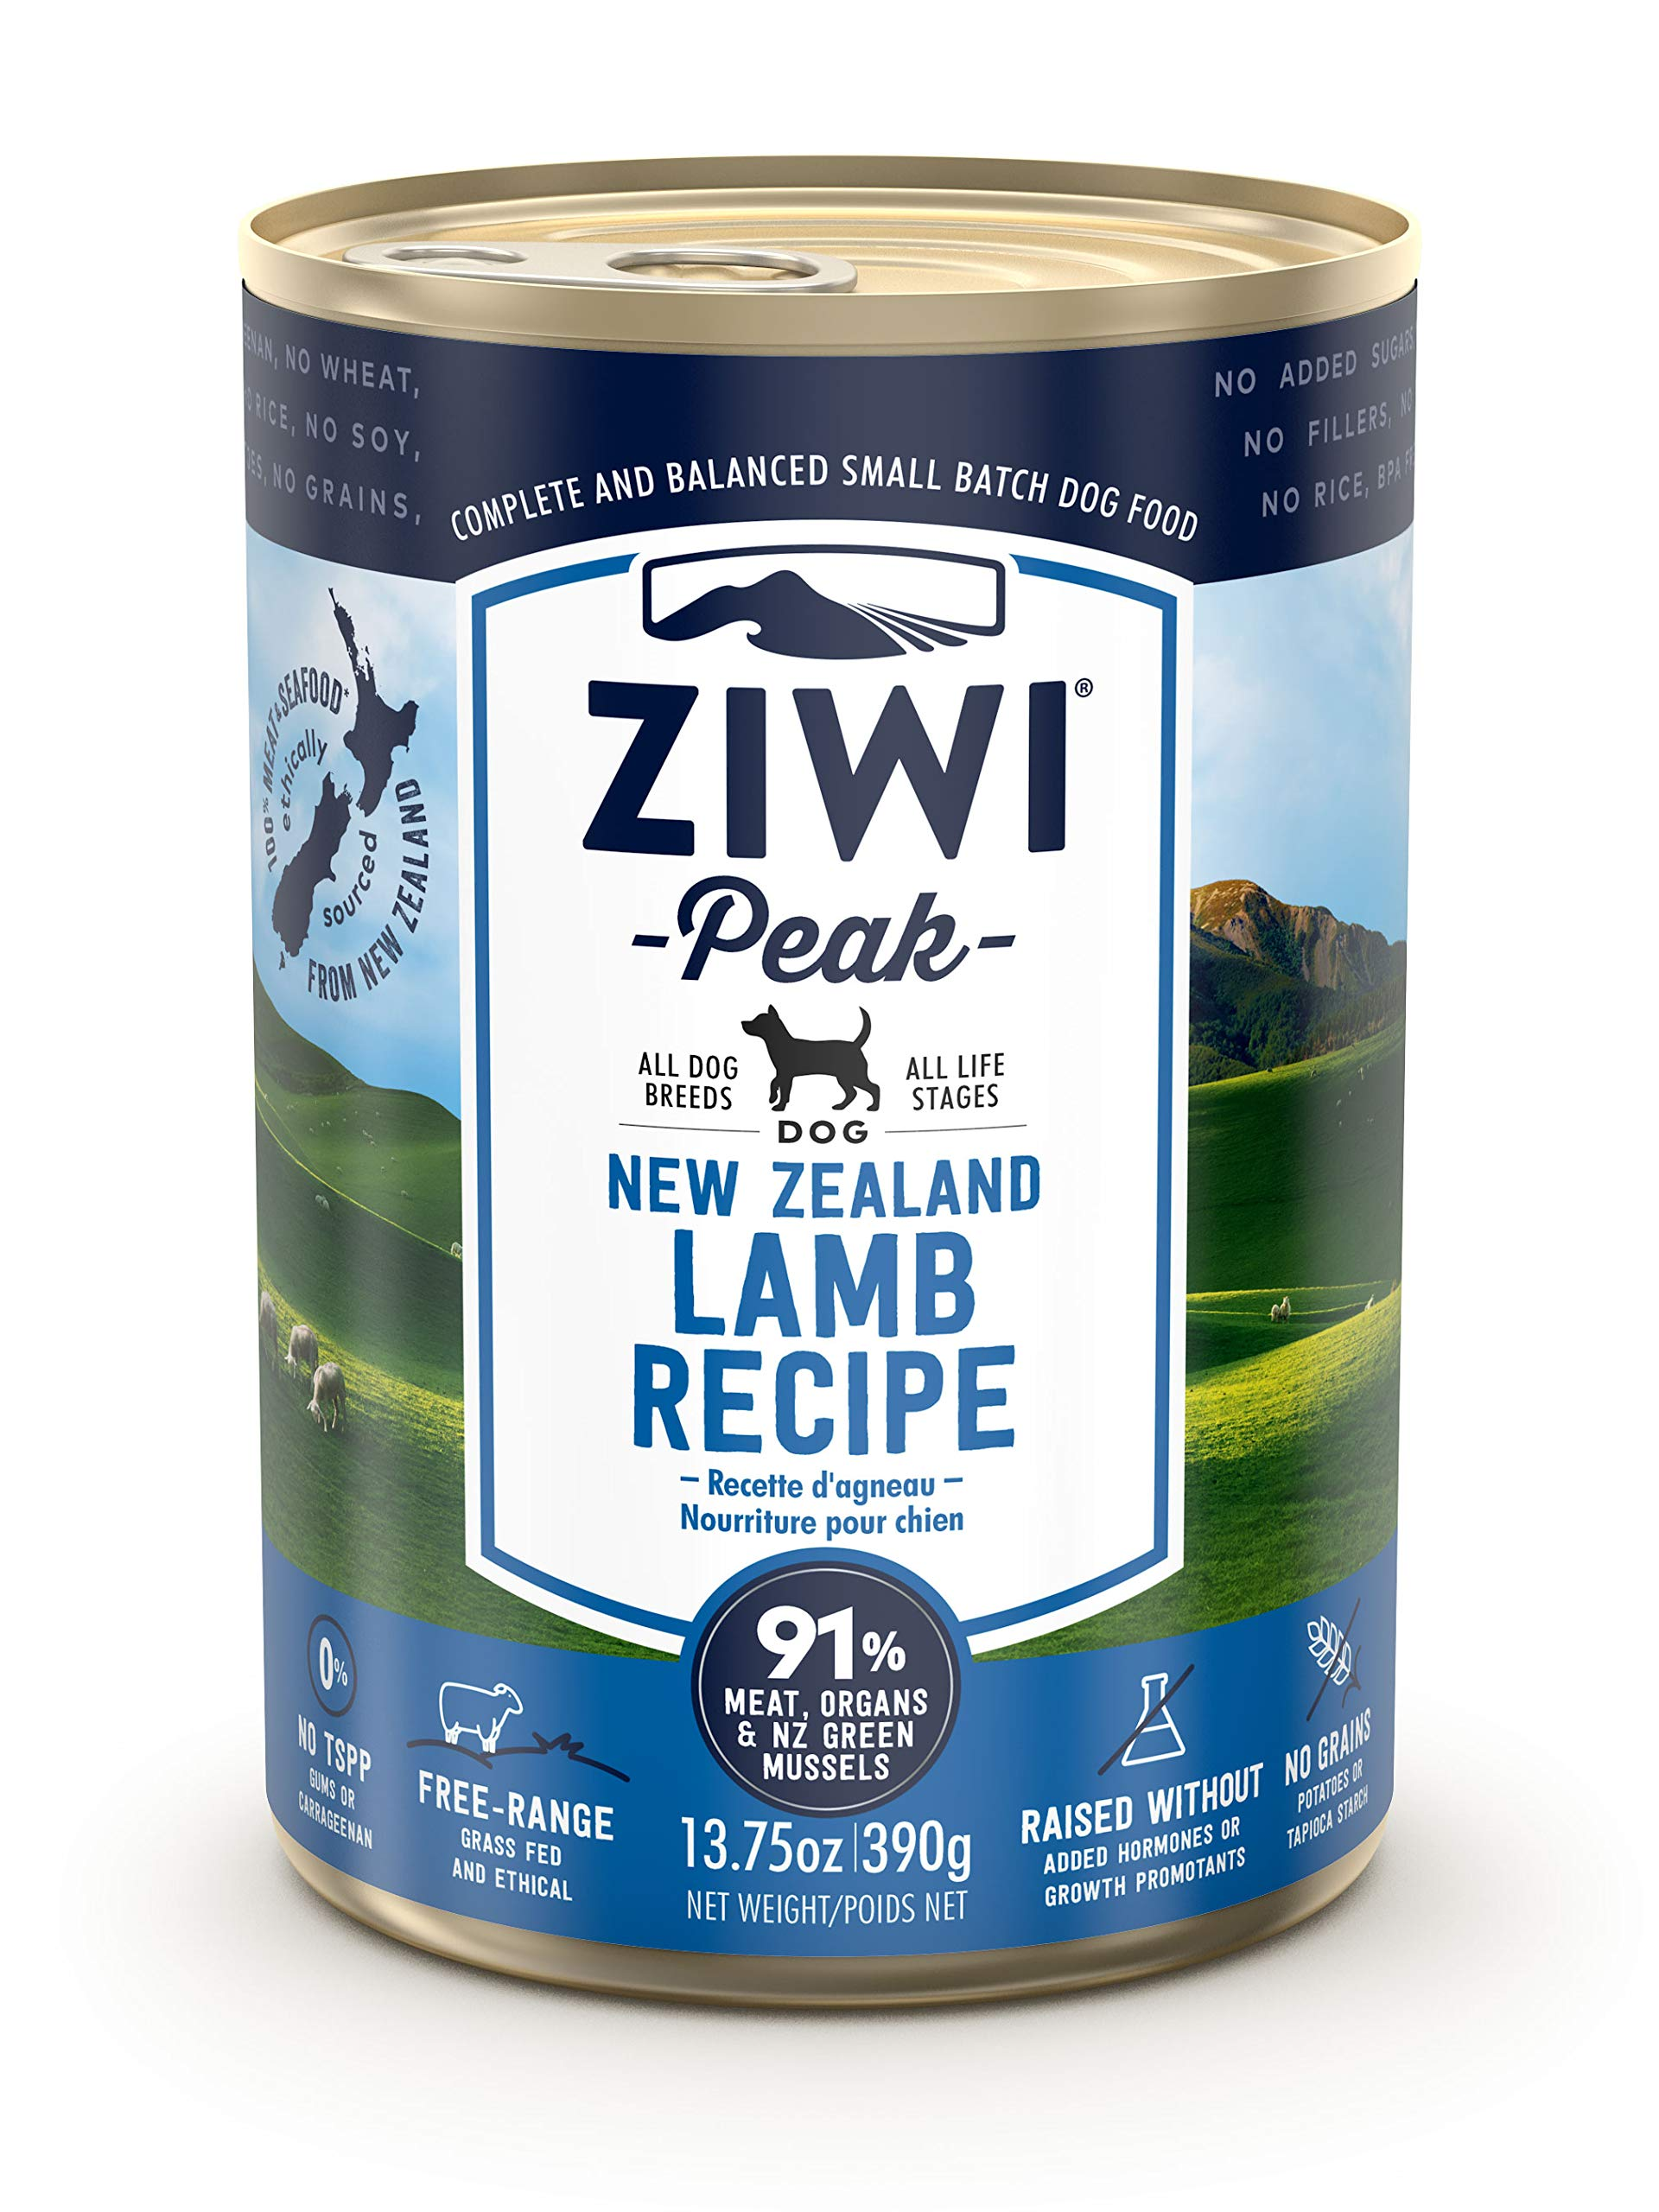 Ziwi Peak Canned Lamb Recipe Dog Food (Case of 12, 13.75 oz. each) by Ziwi Peak